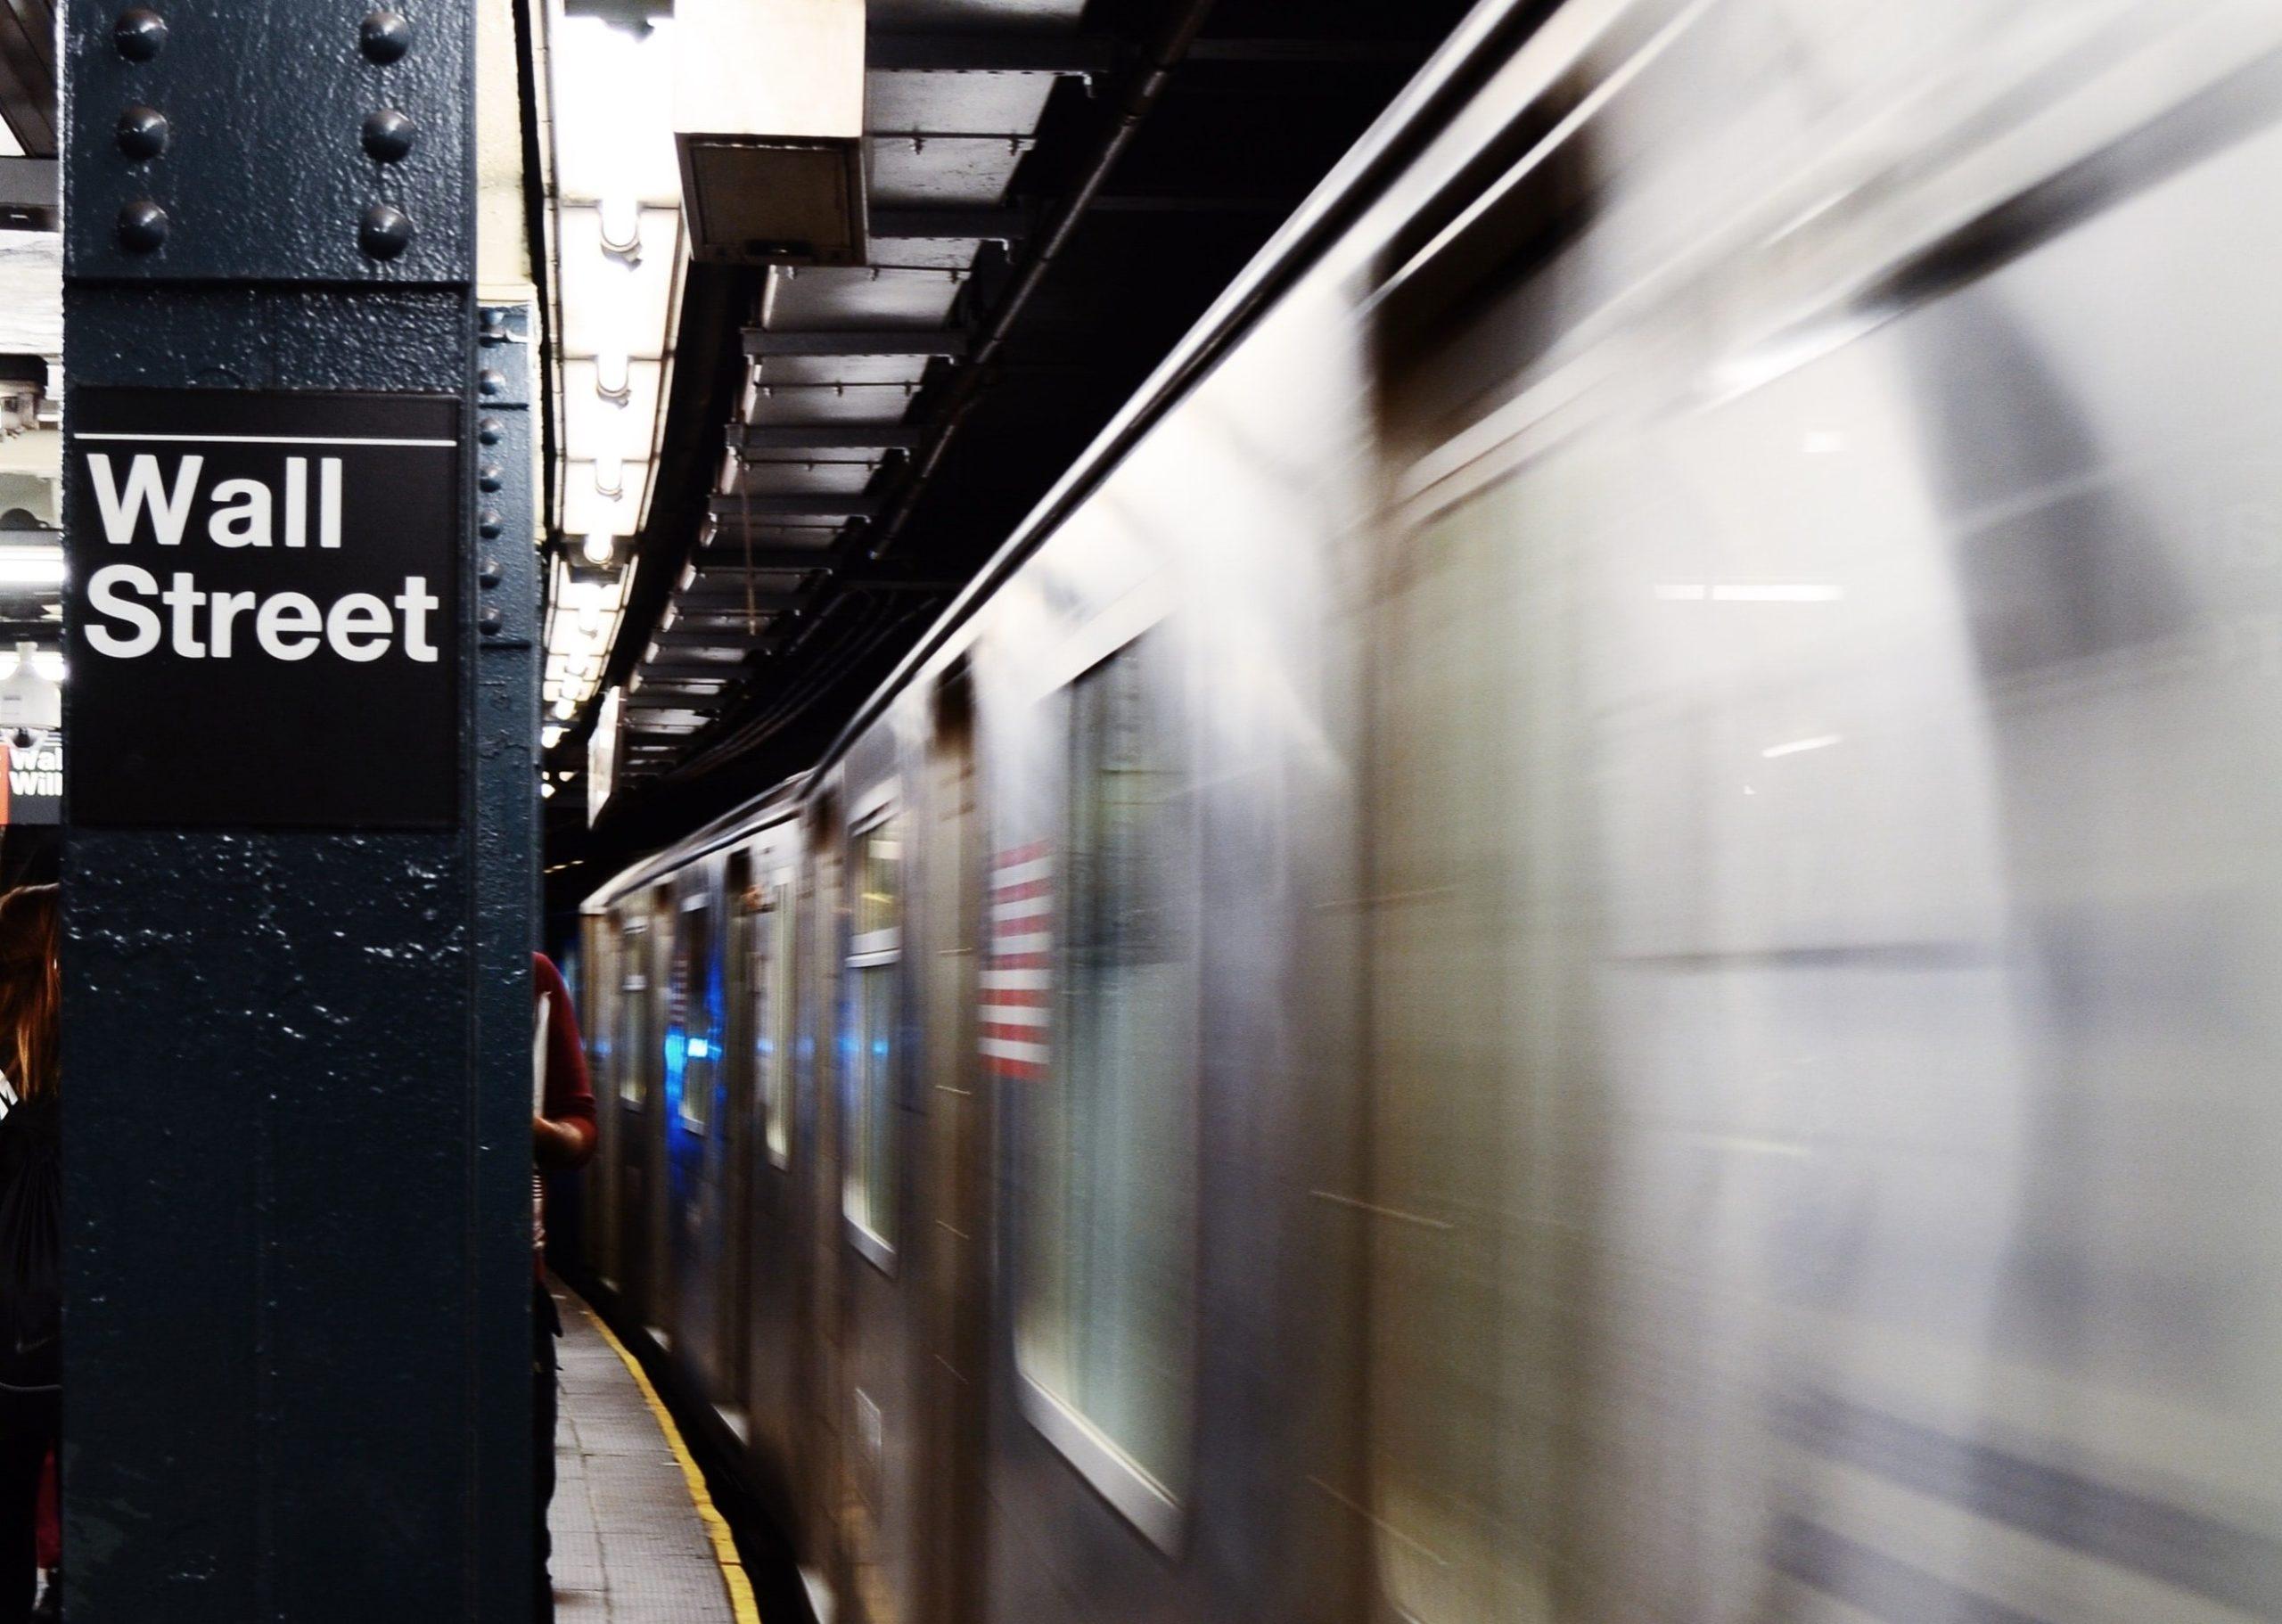 The Wall Street subway stop